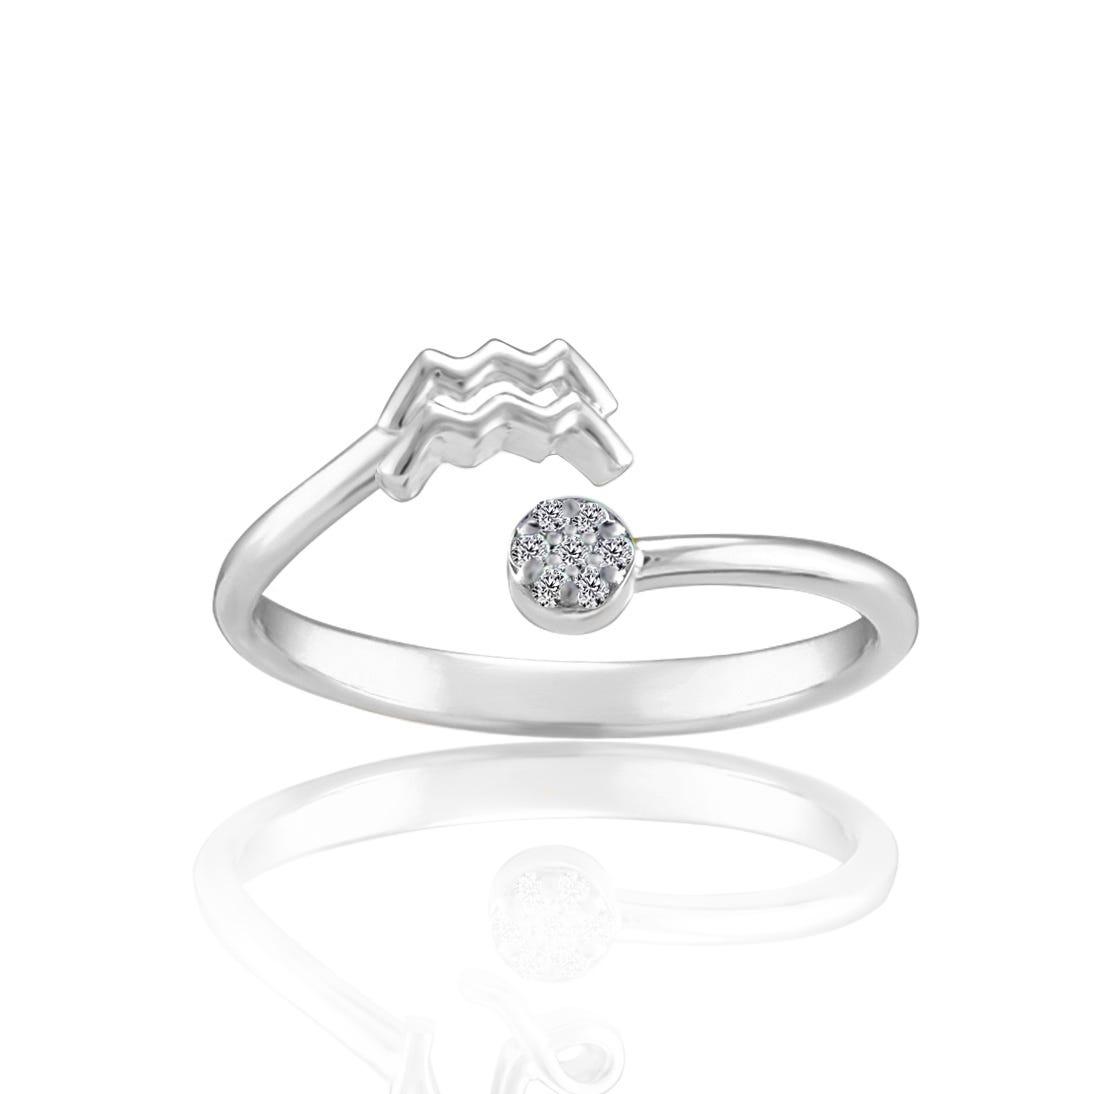 Zodiac Diamond Aquarius Fashion Ring in Sterling Silver